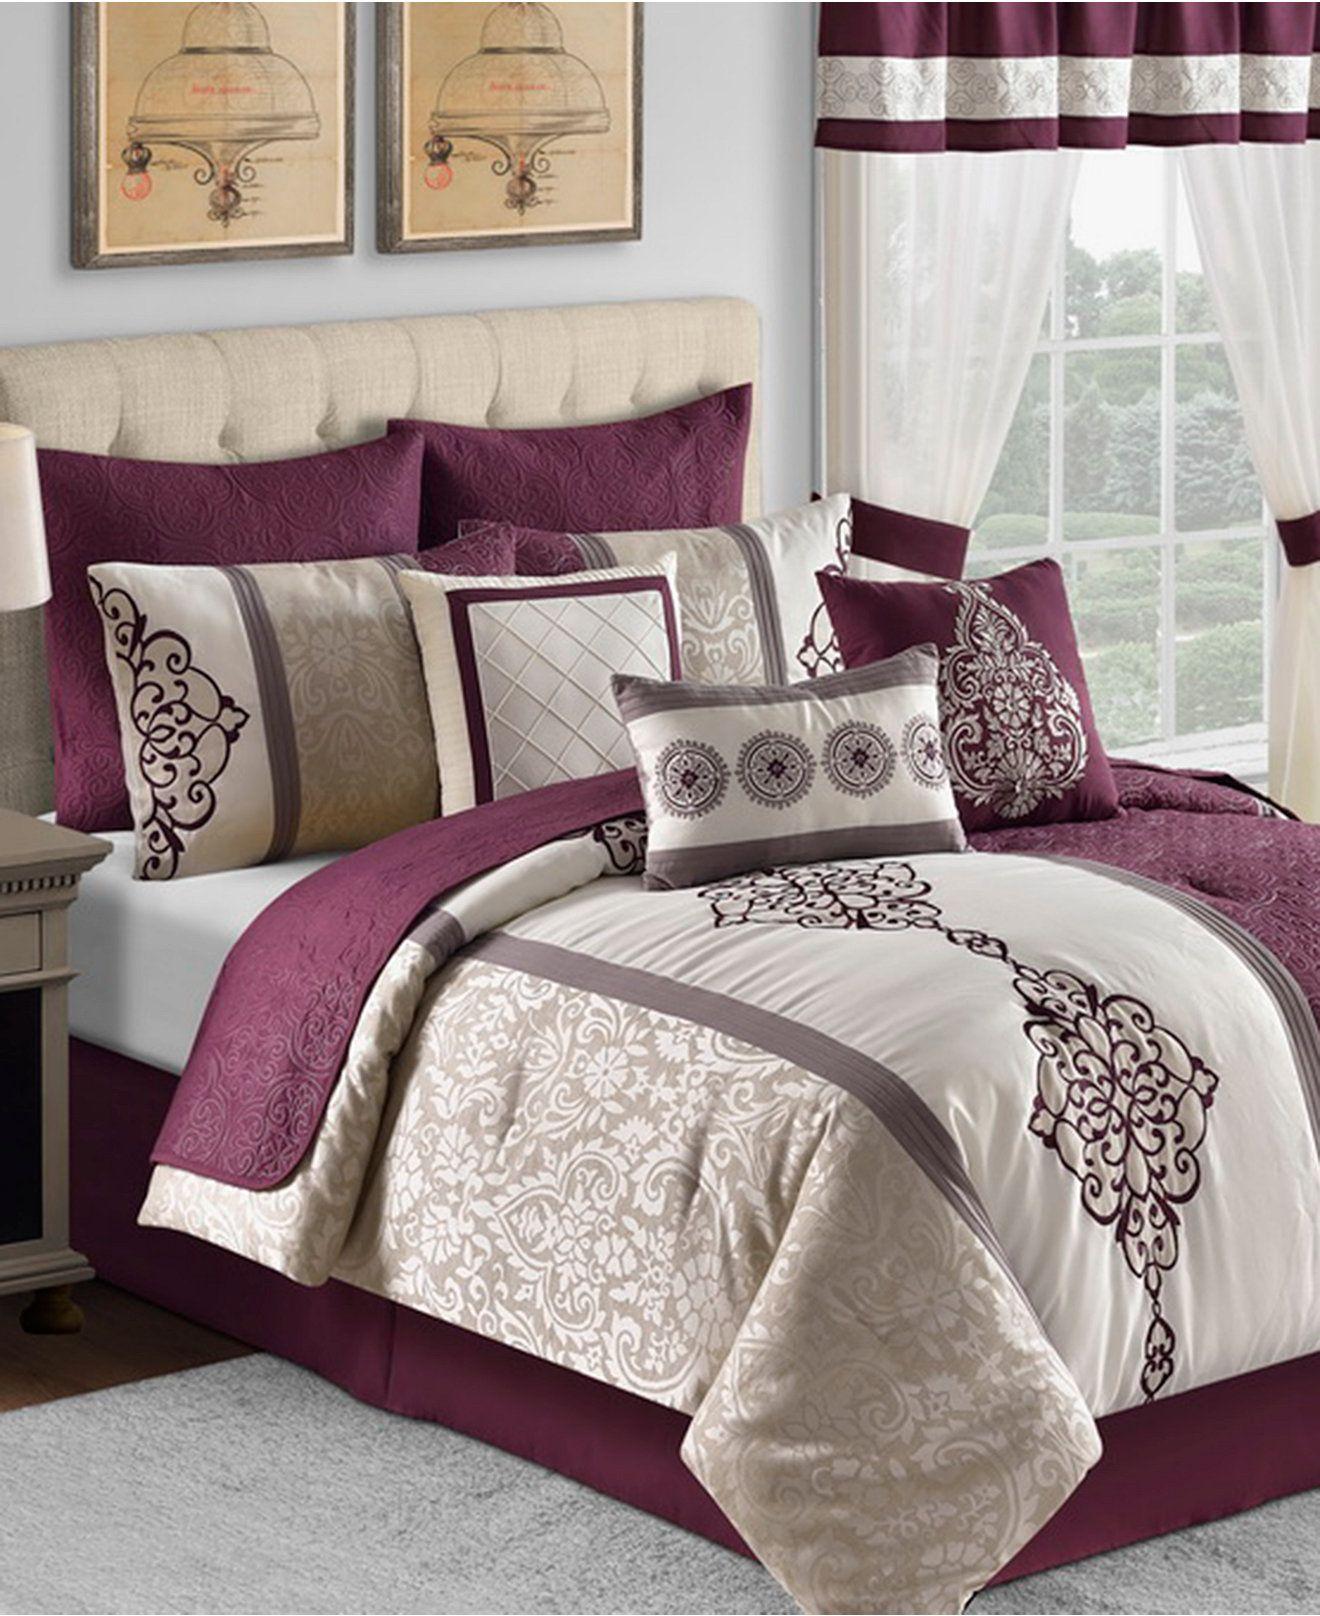 Kayden 22 Piece forter Set Bed in a Bag Bed & Bath Macy s